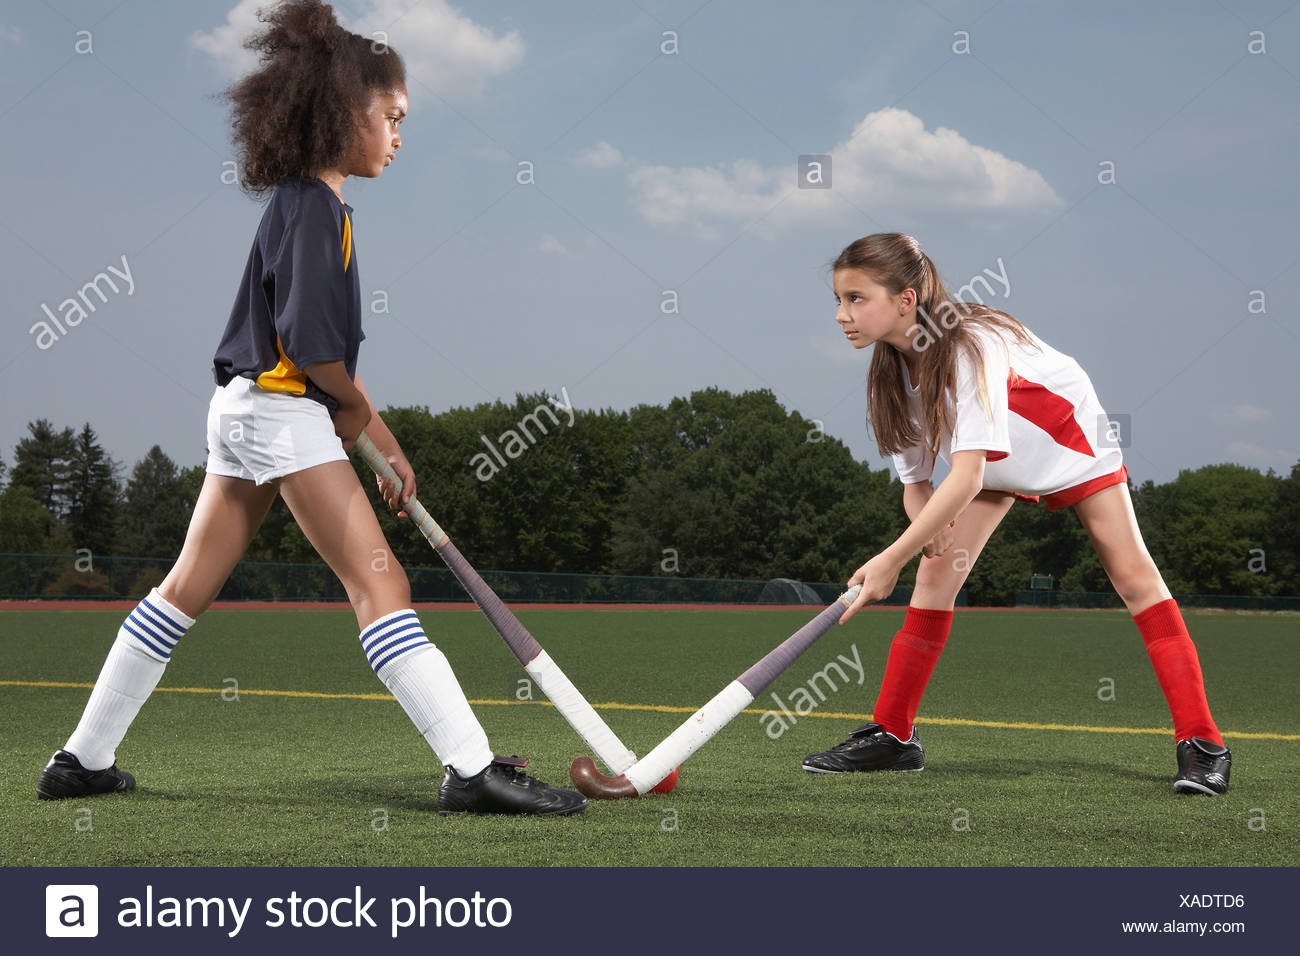 Rival hockey players - Stock Image